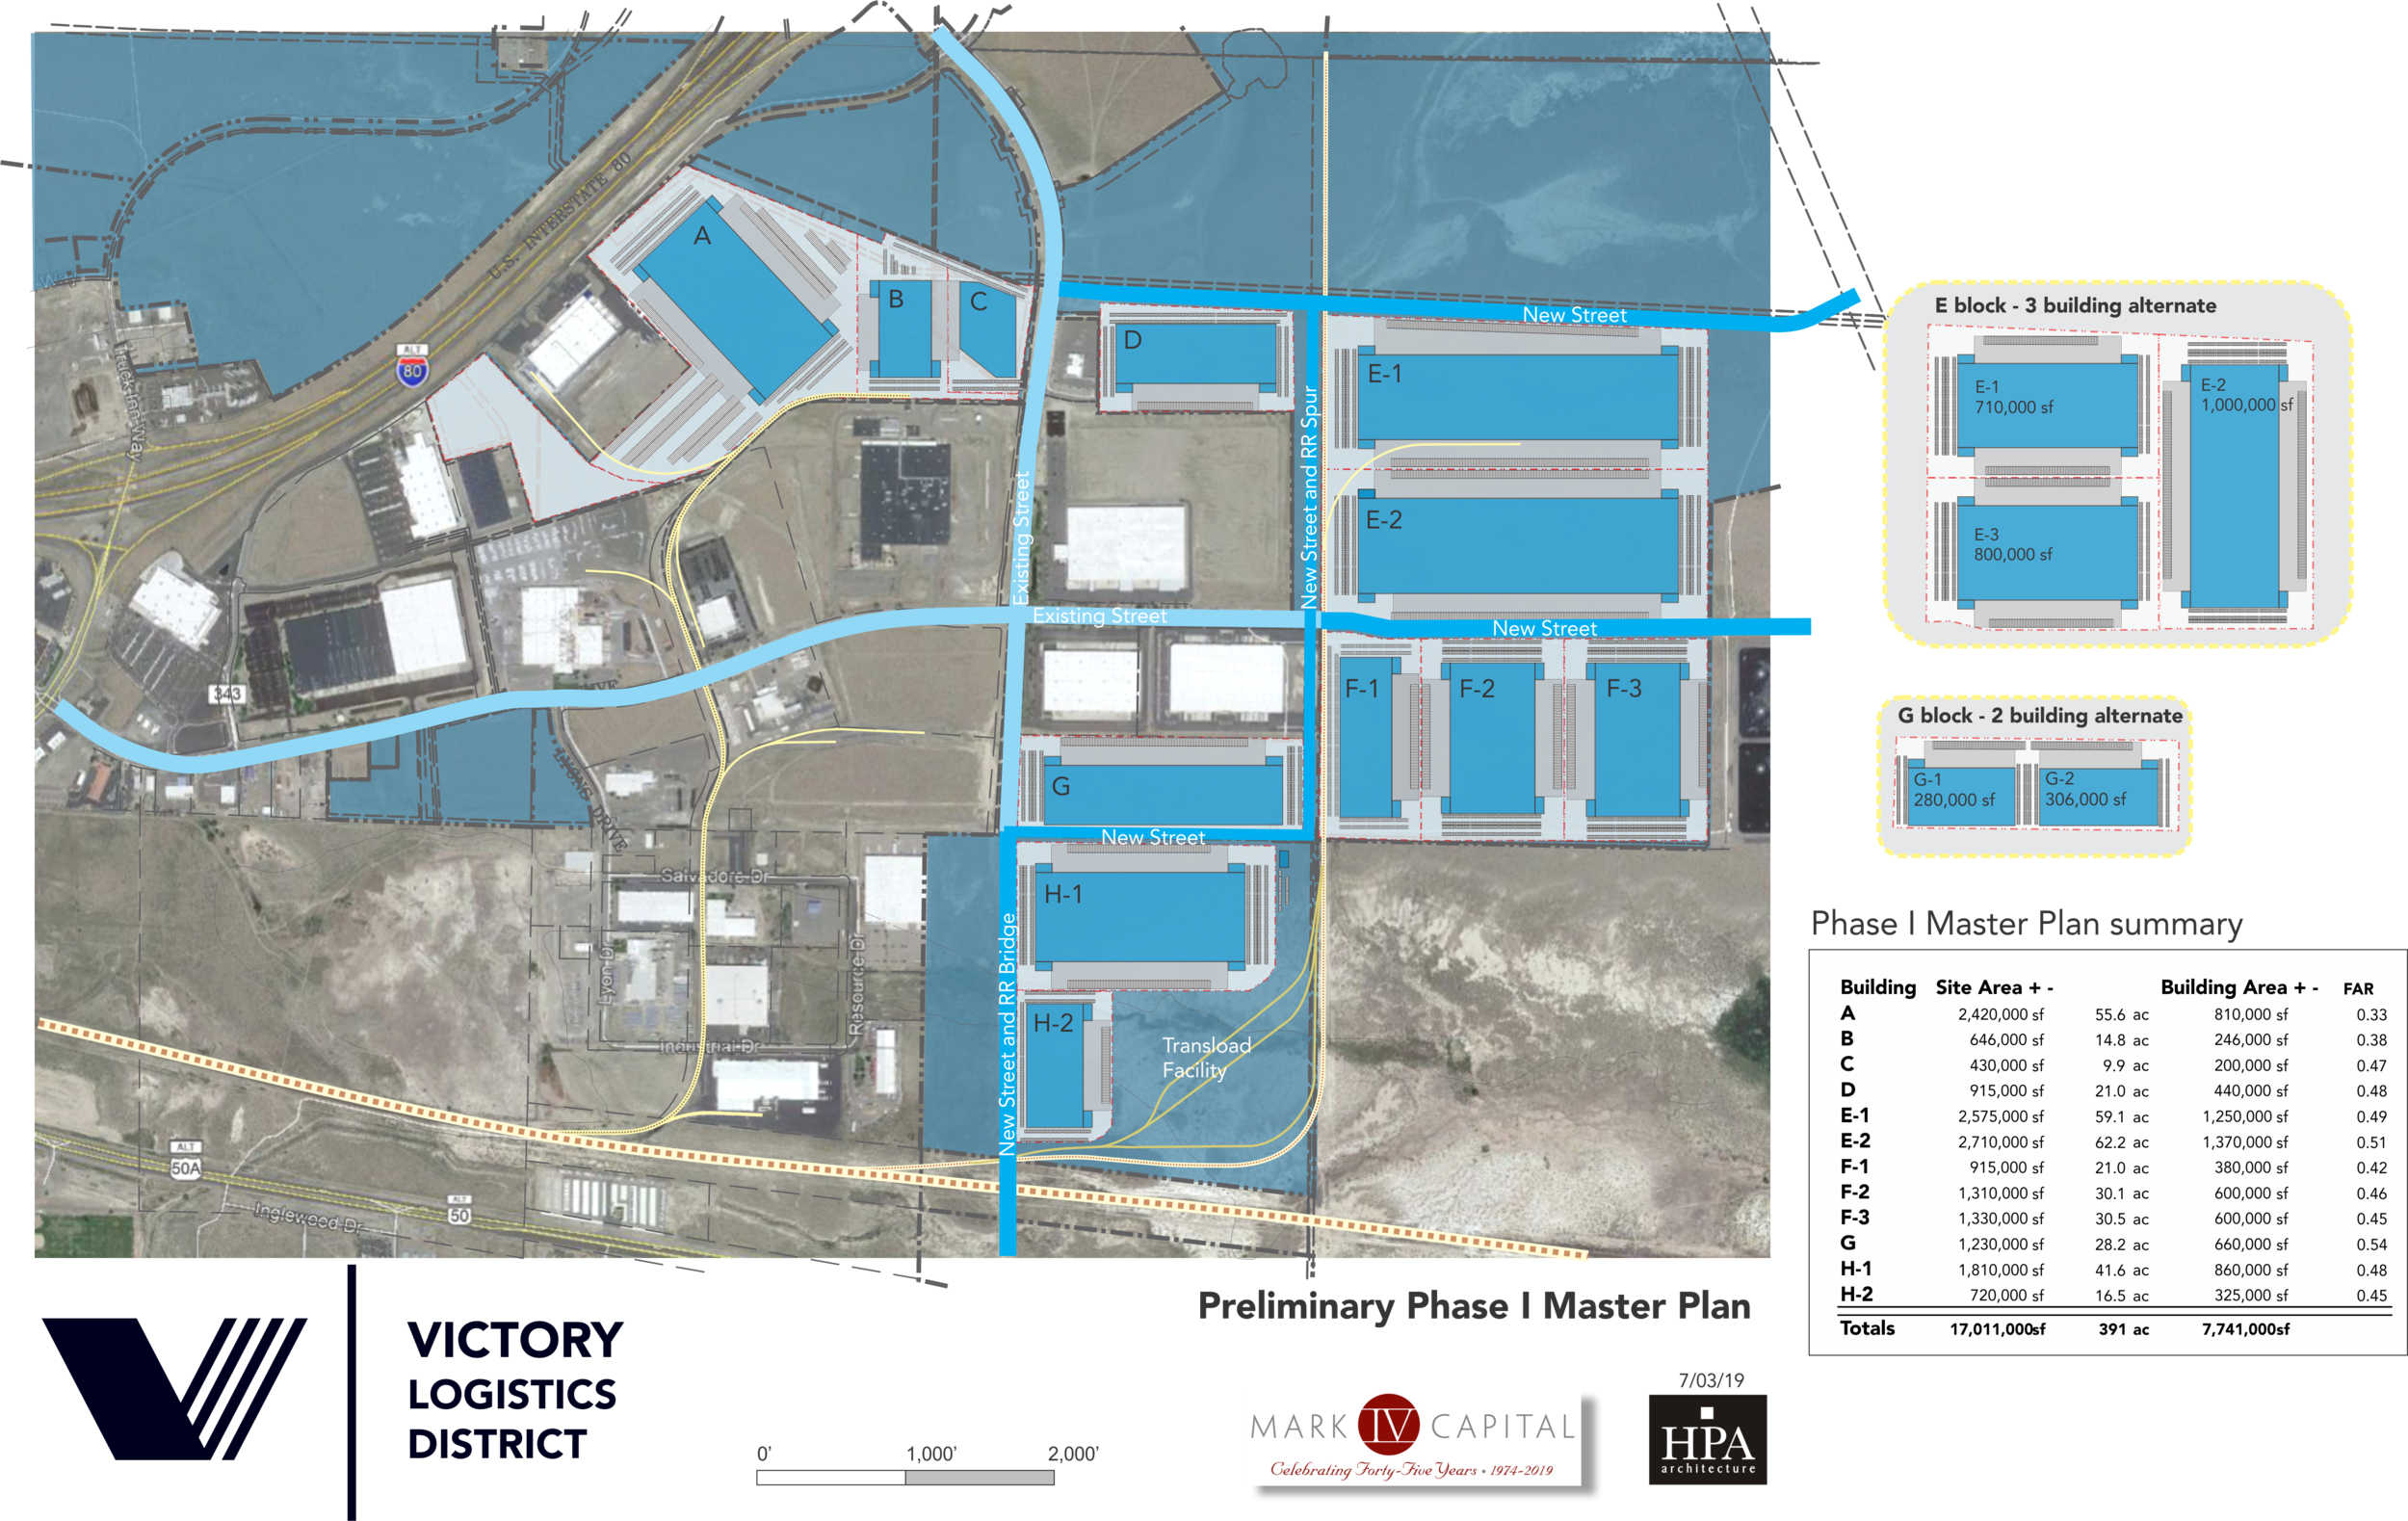 mark 4 fernley master plan phase 1 190709.png